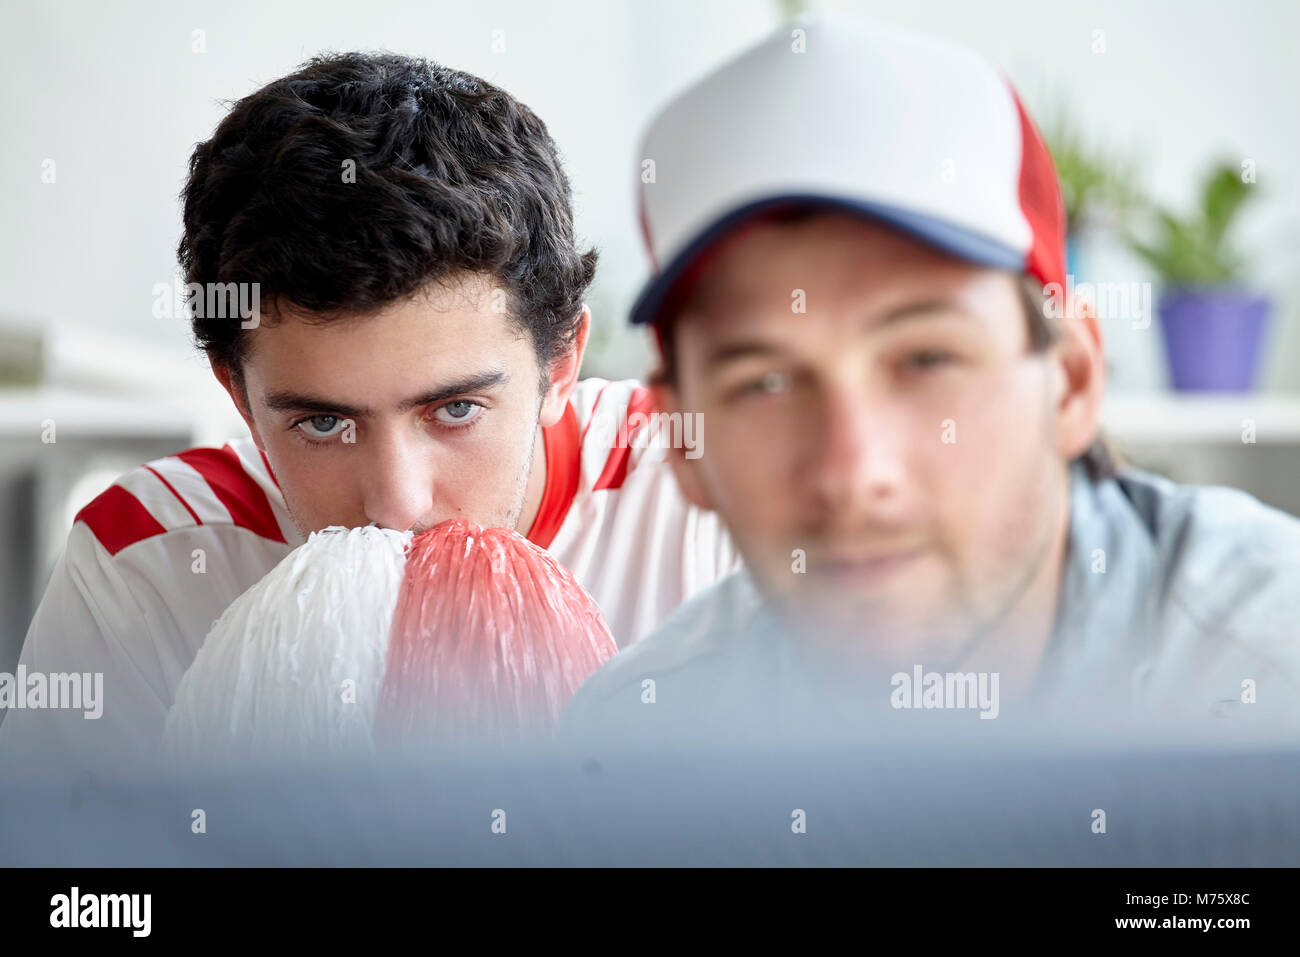 Sport Fans sehnsüchtig auf TV ansehen Stockbild